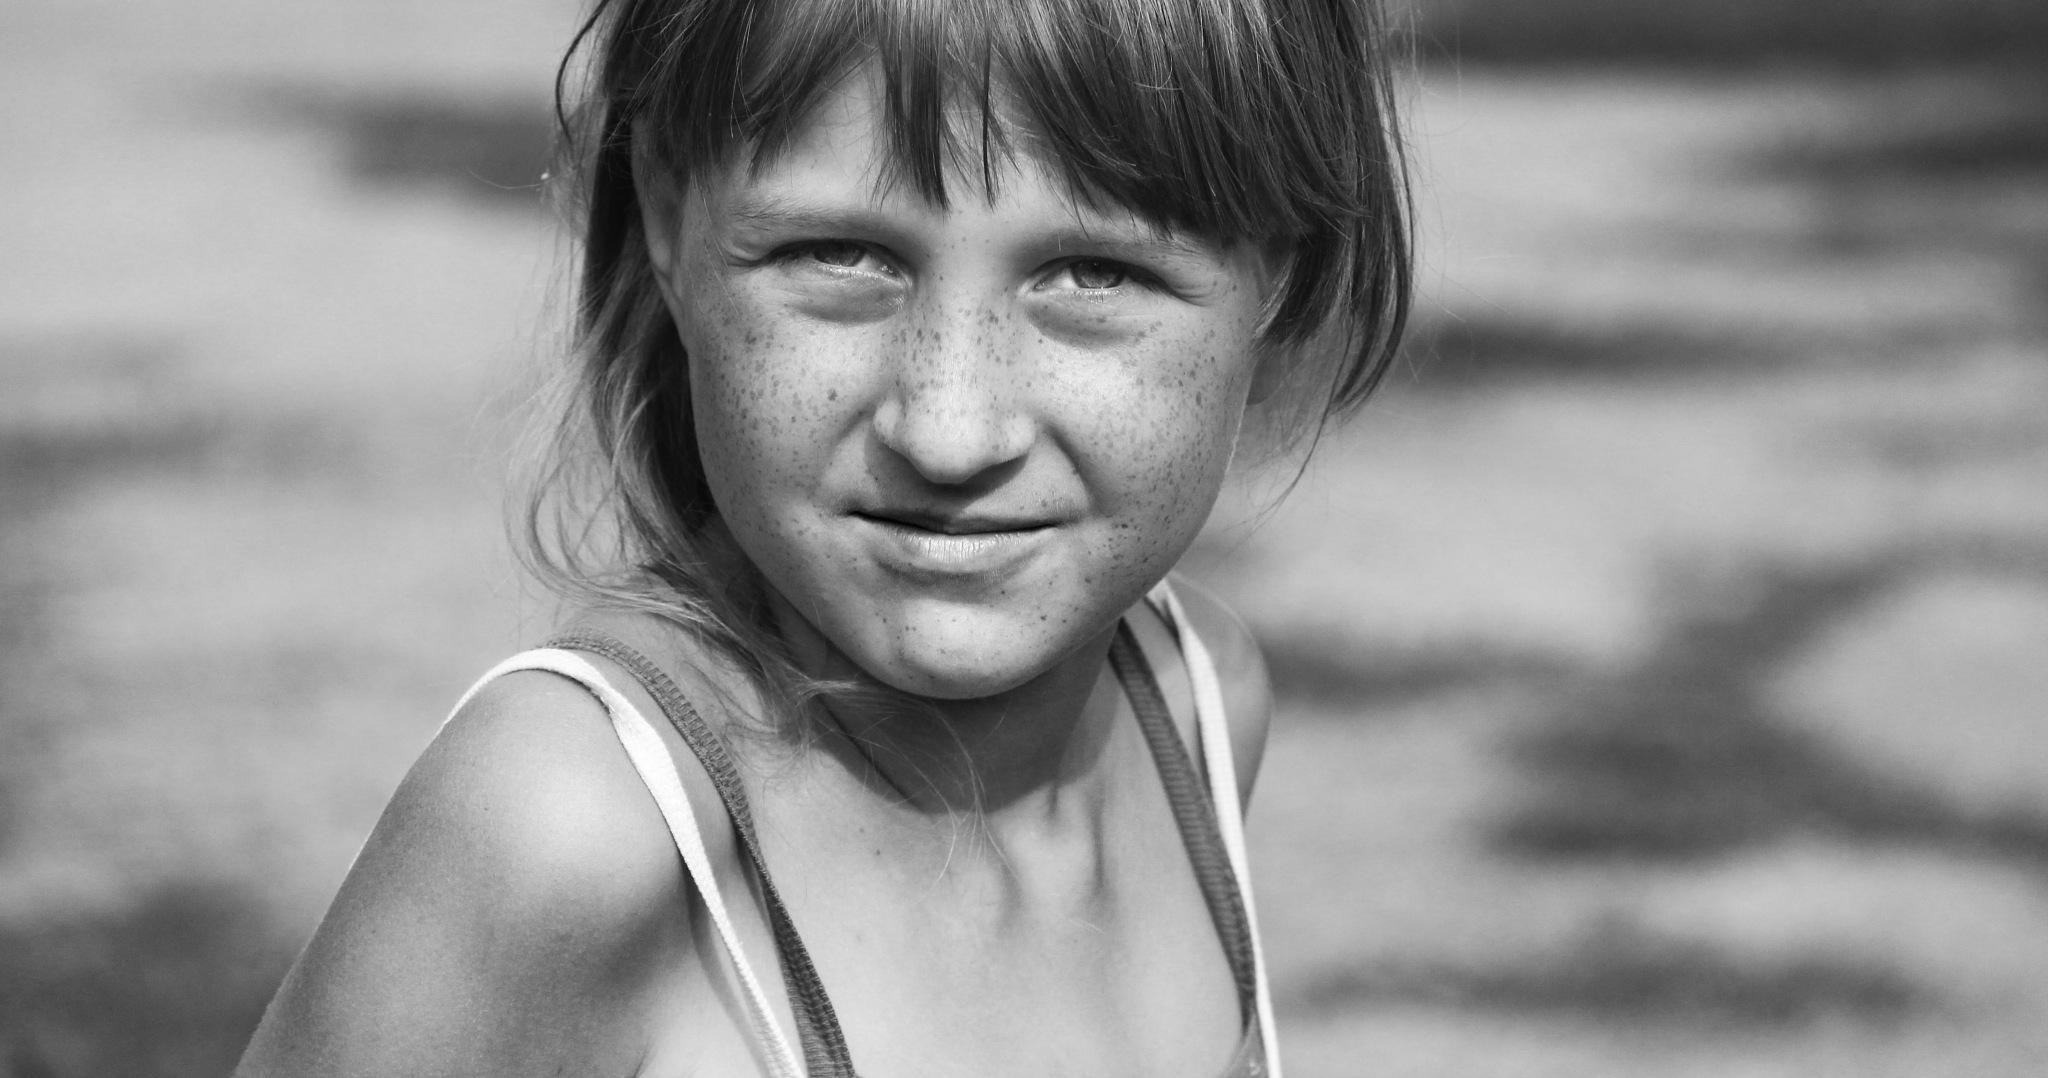 The girl from the village Kremionki by Сергей Юрьев